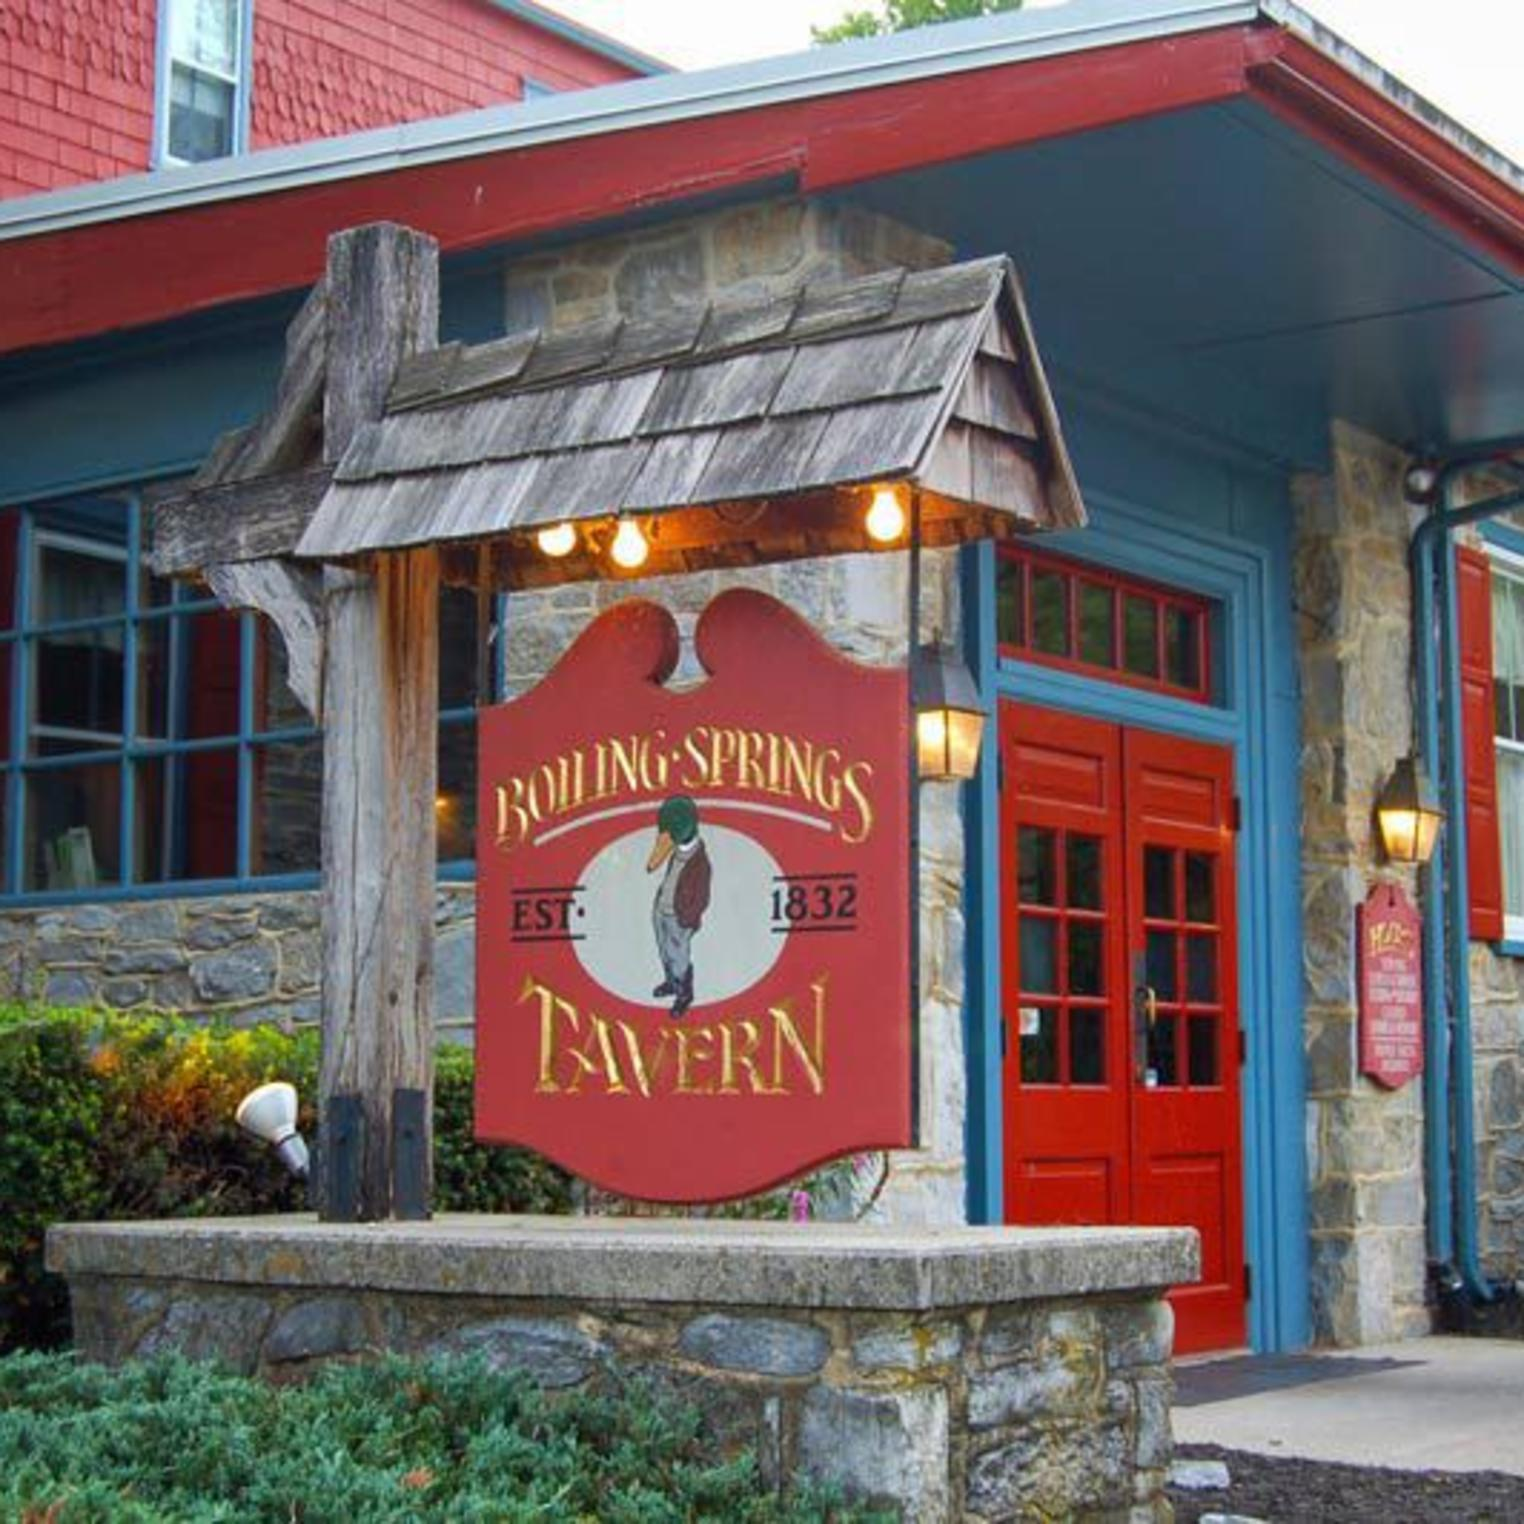 Boiling Springs Tavern